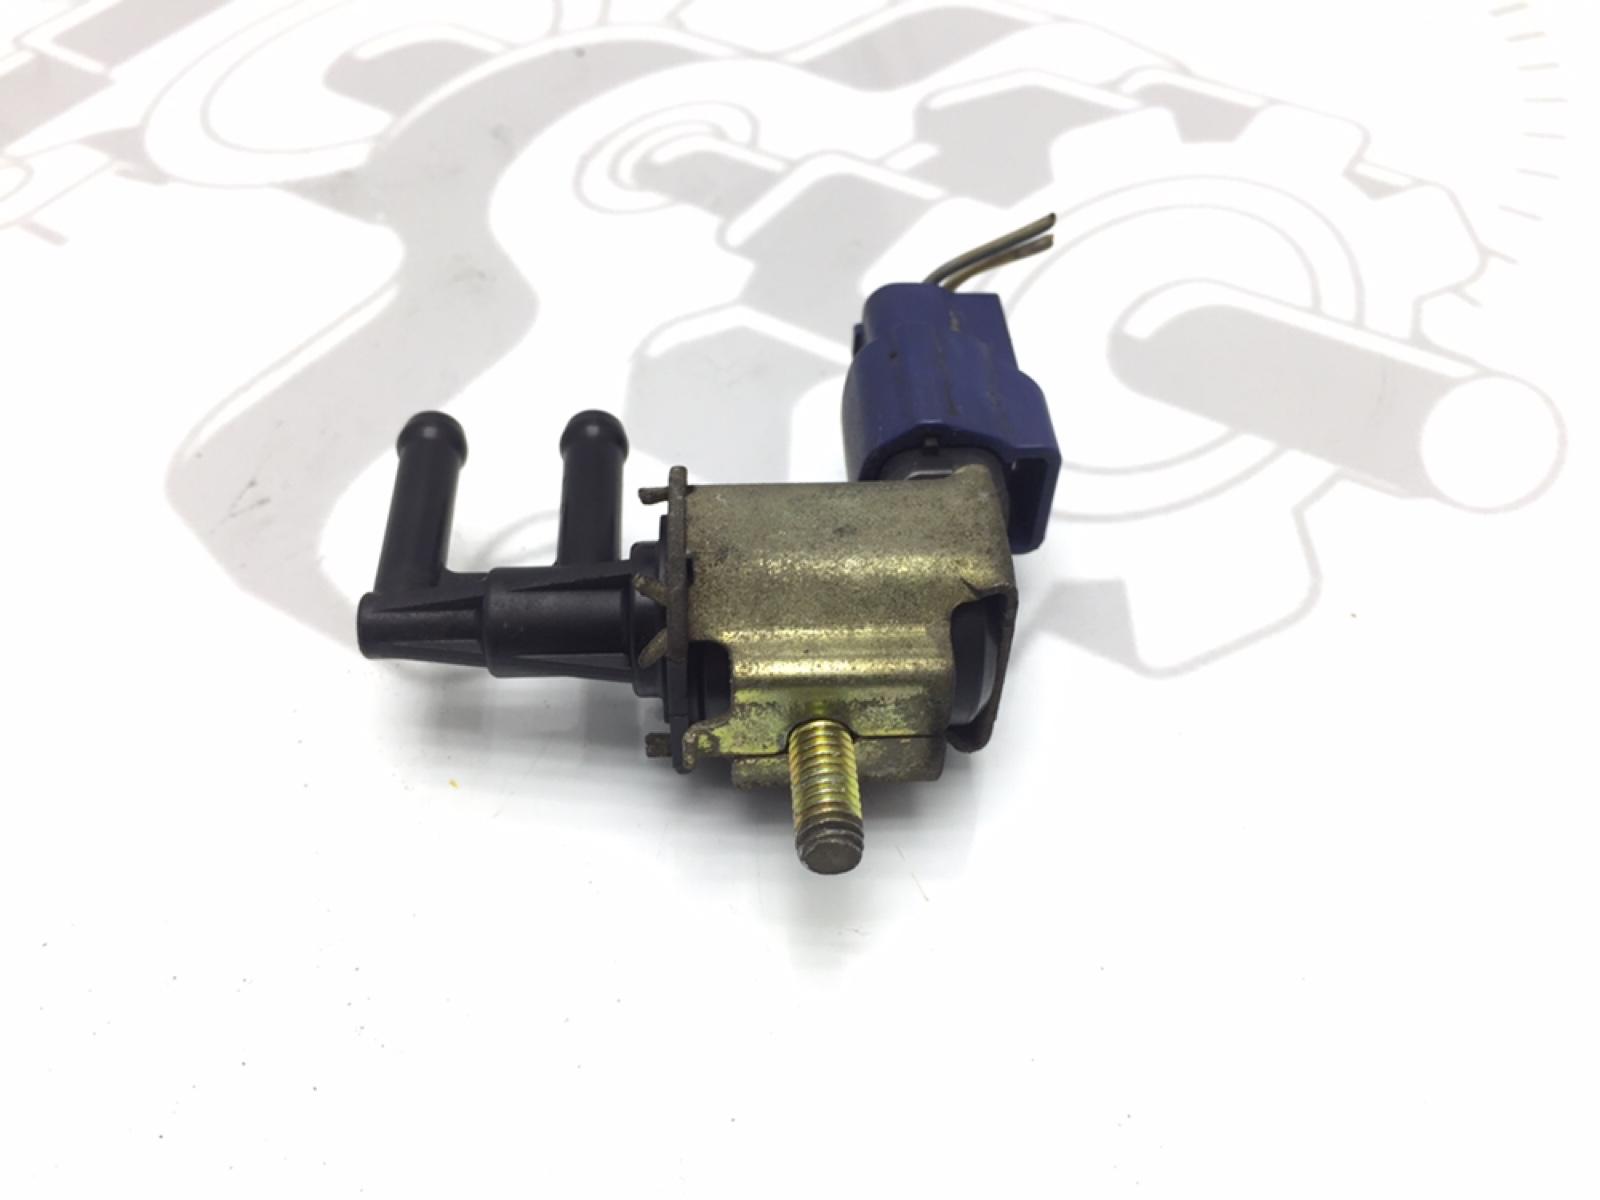 Клапан воздушный Nissan Almera N16 1.5 I 2003 (б/у)